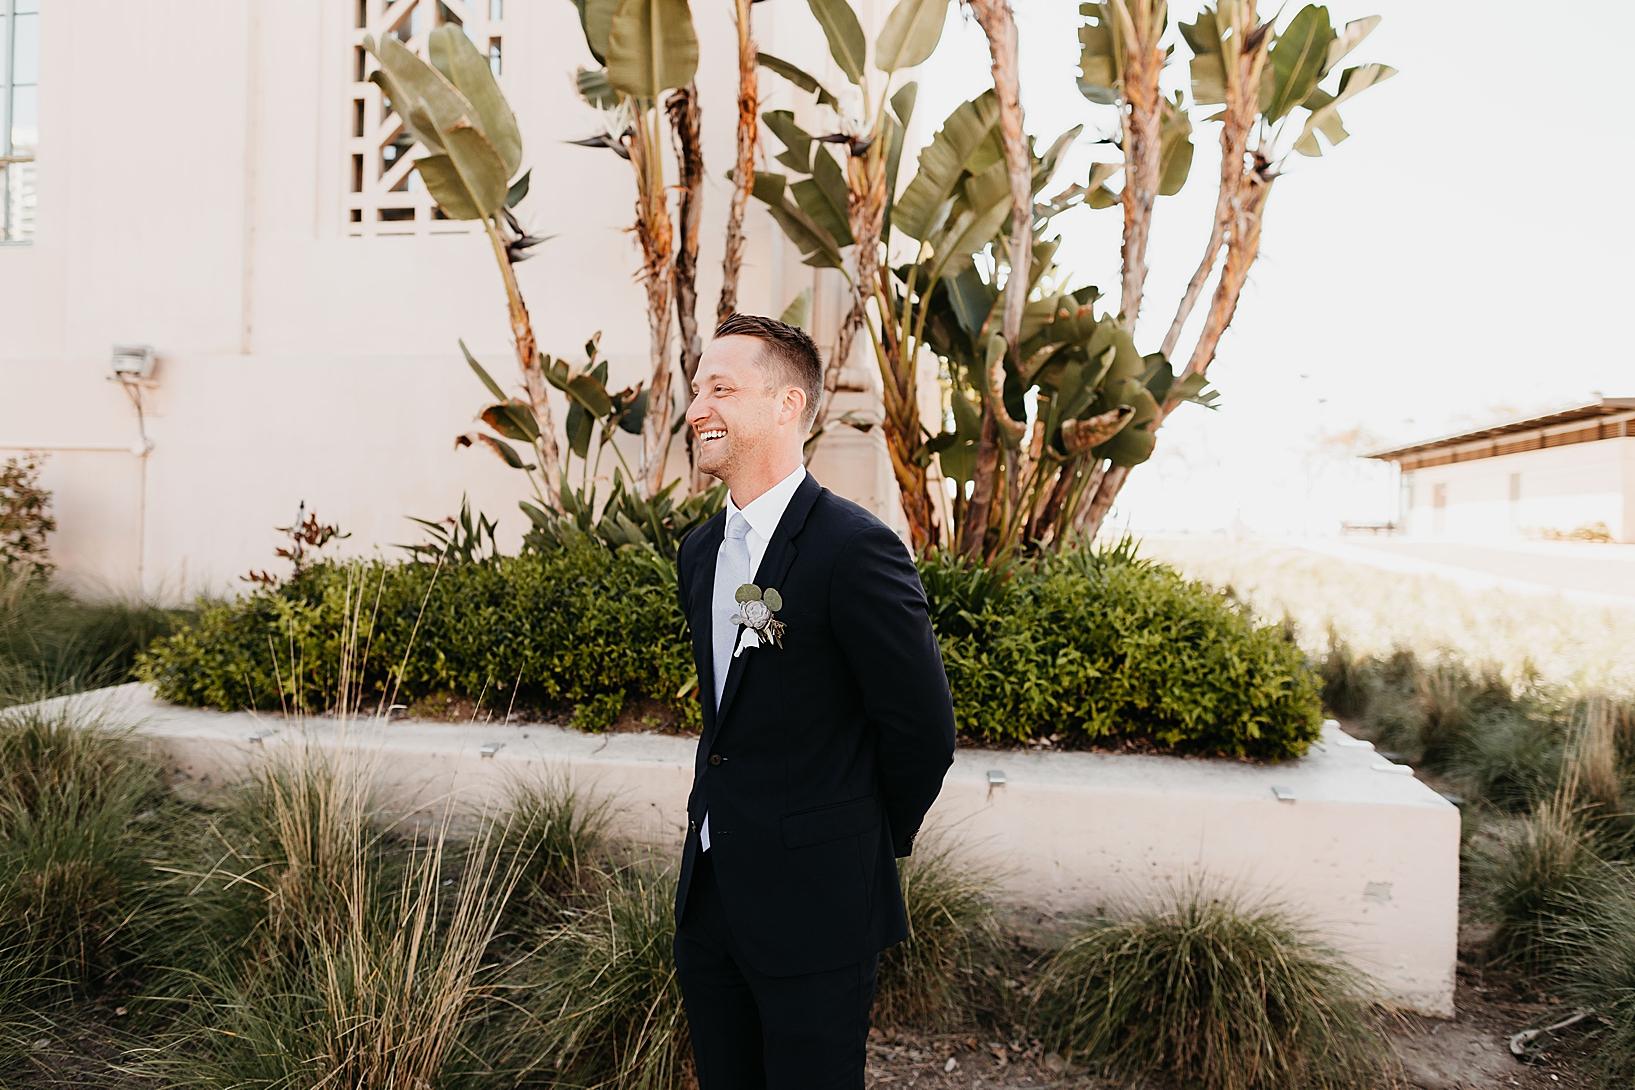 Herb-and-Wood-Wedding-10.jpg